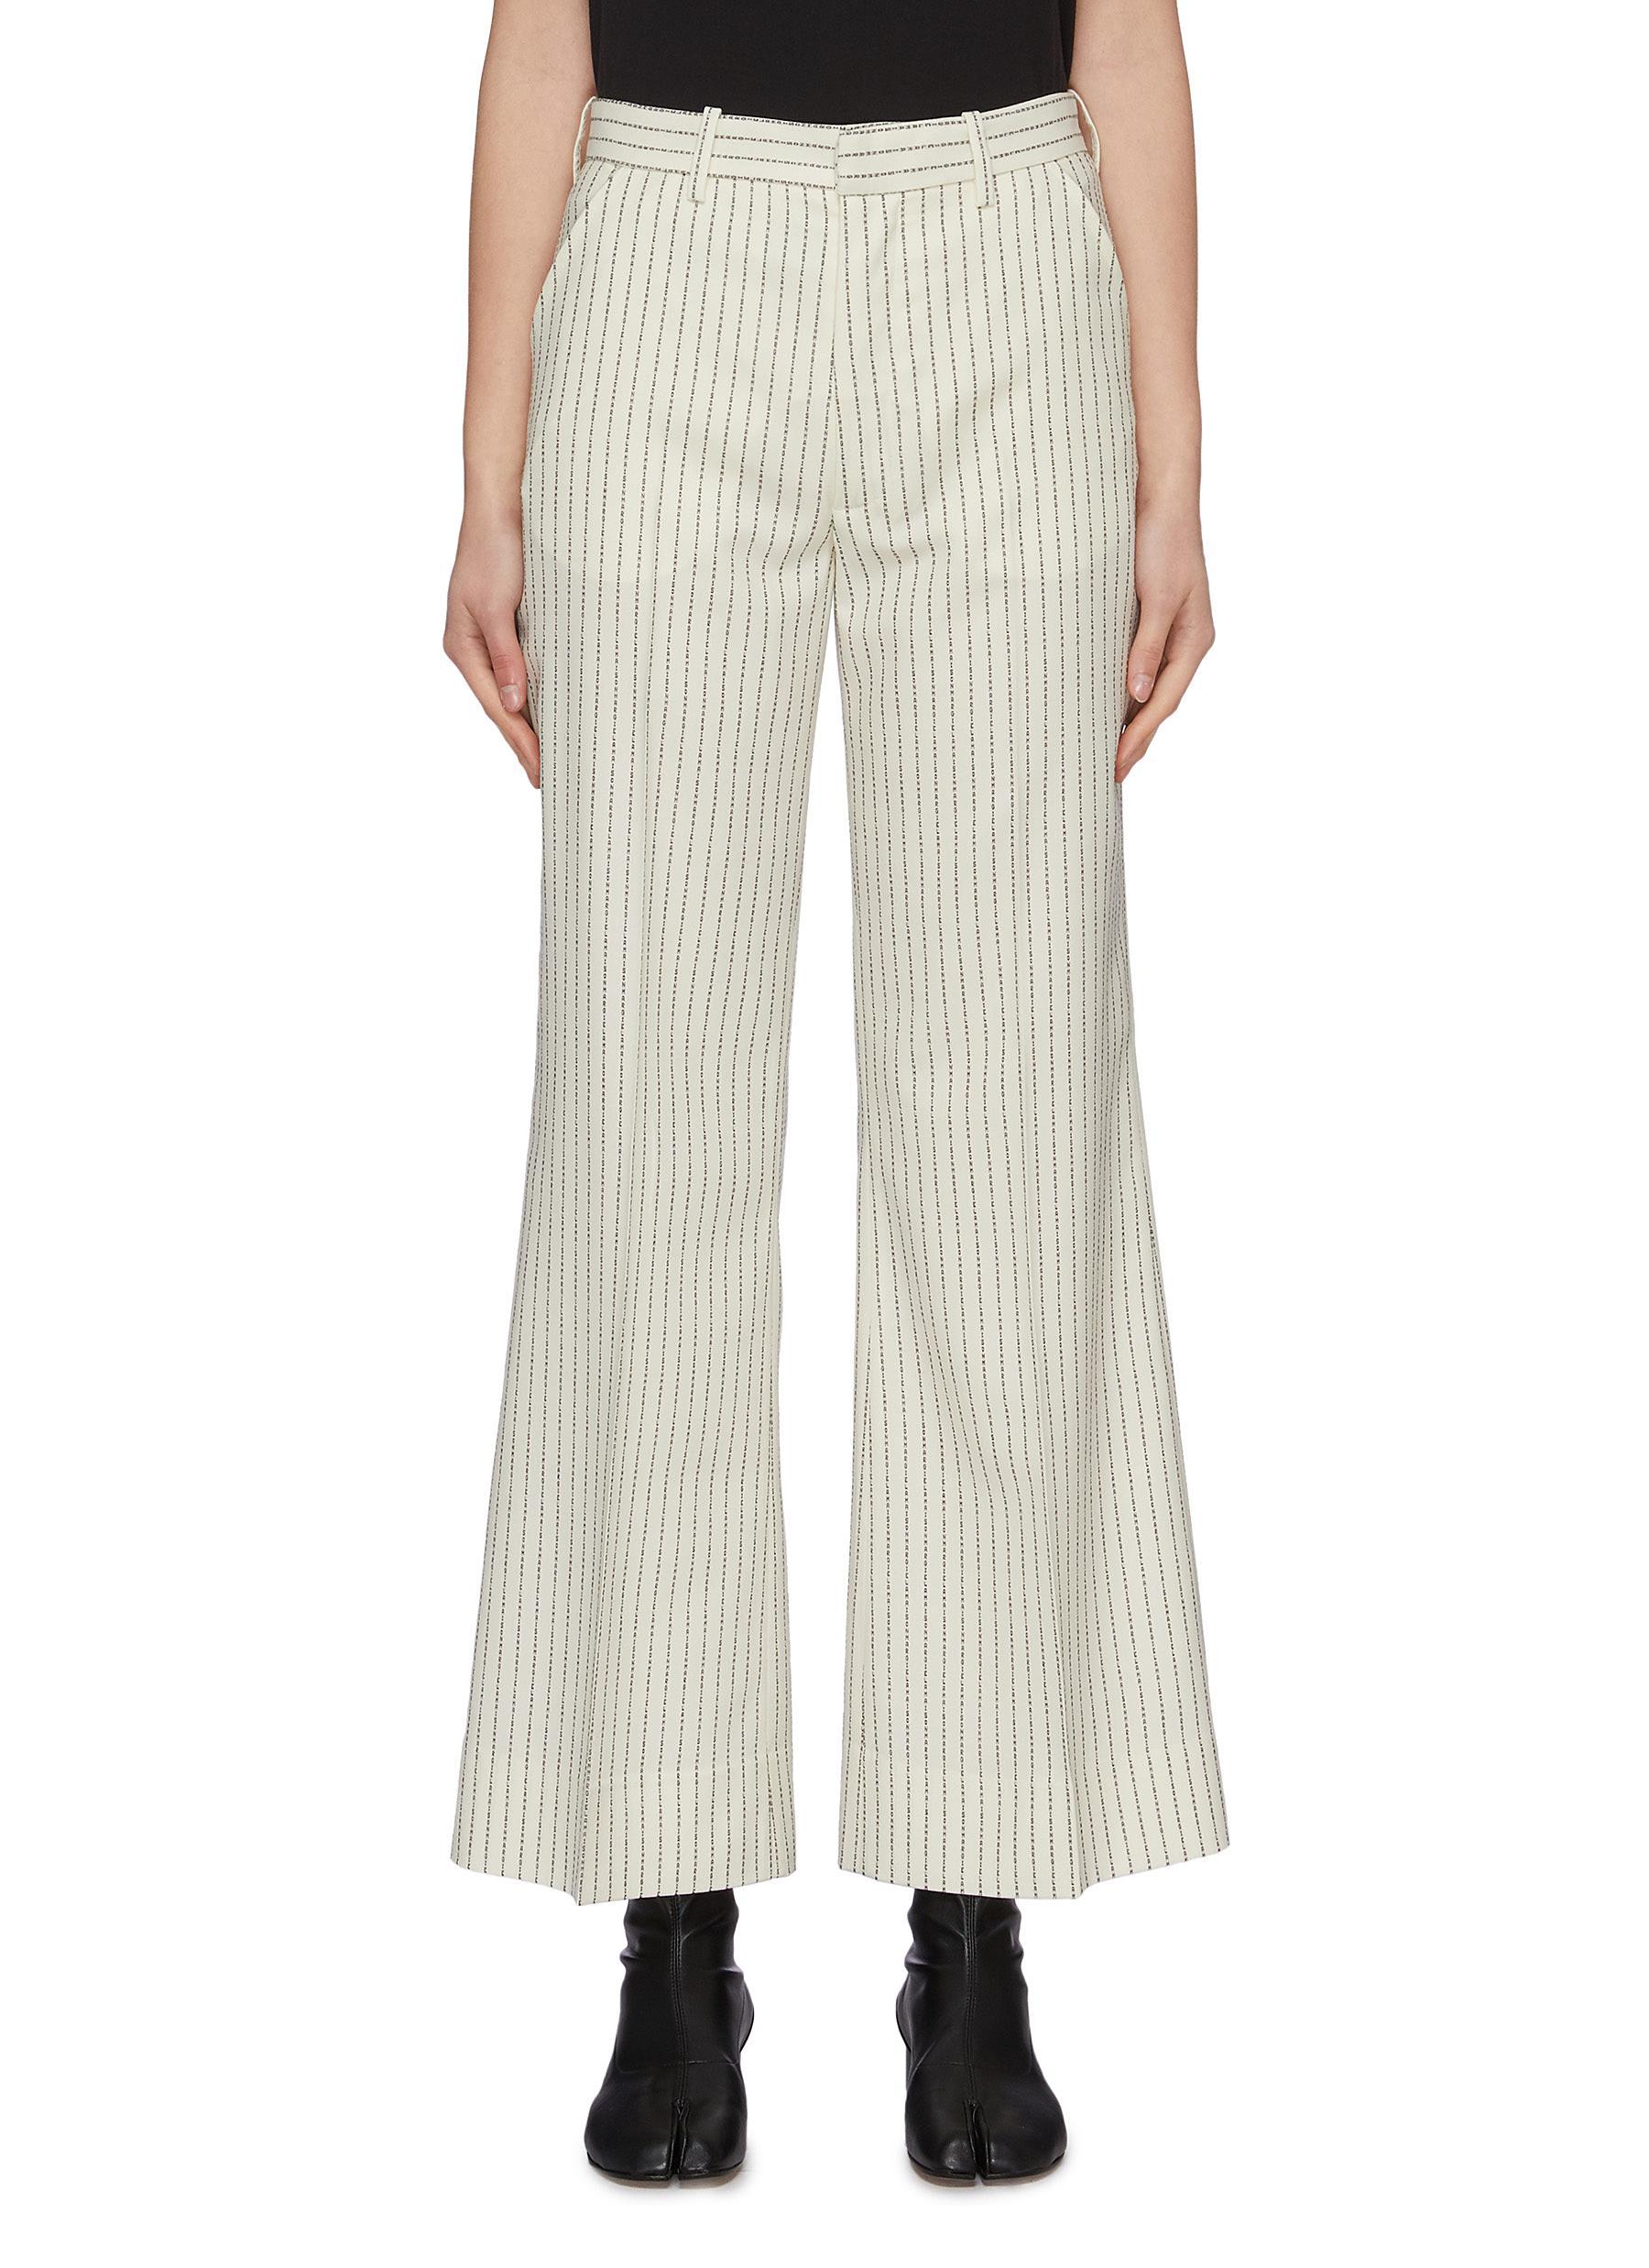 Buy Maison Margiela Pants & Shorts Logo pinstripe flared pants